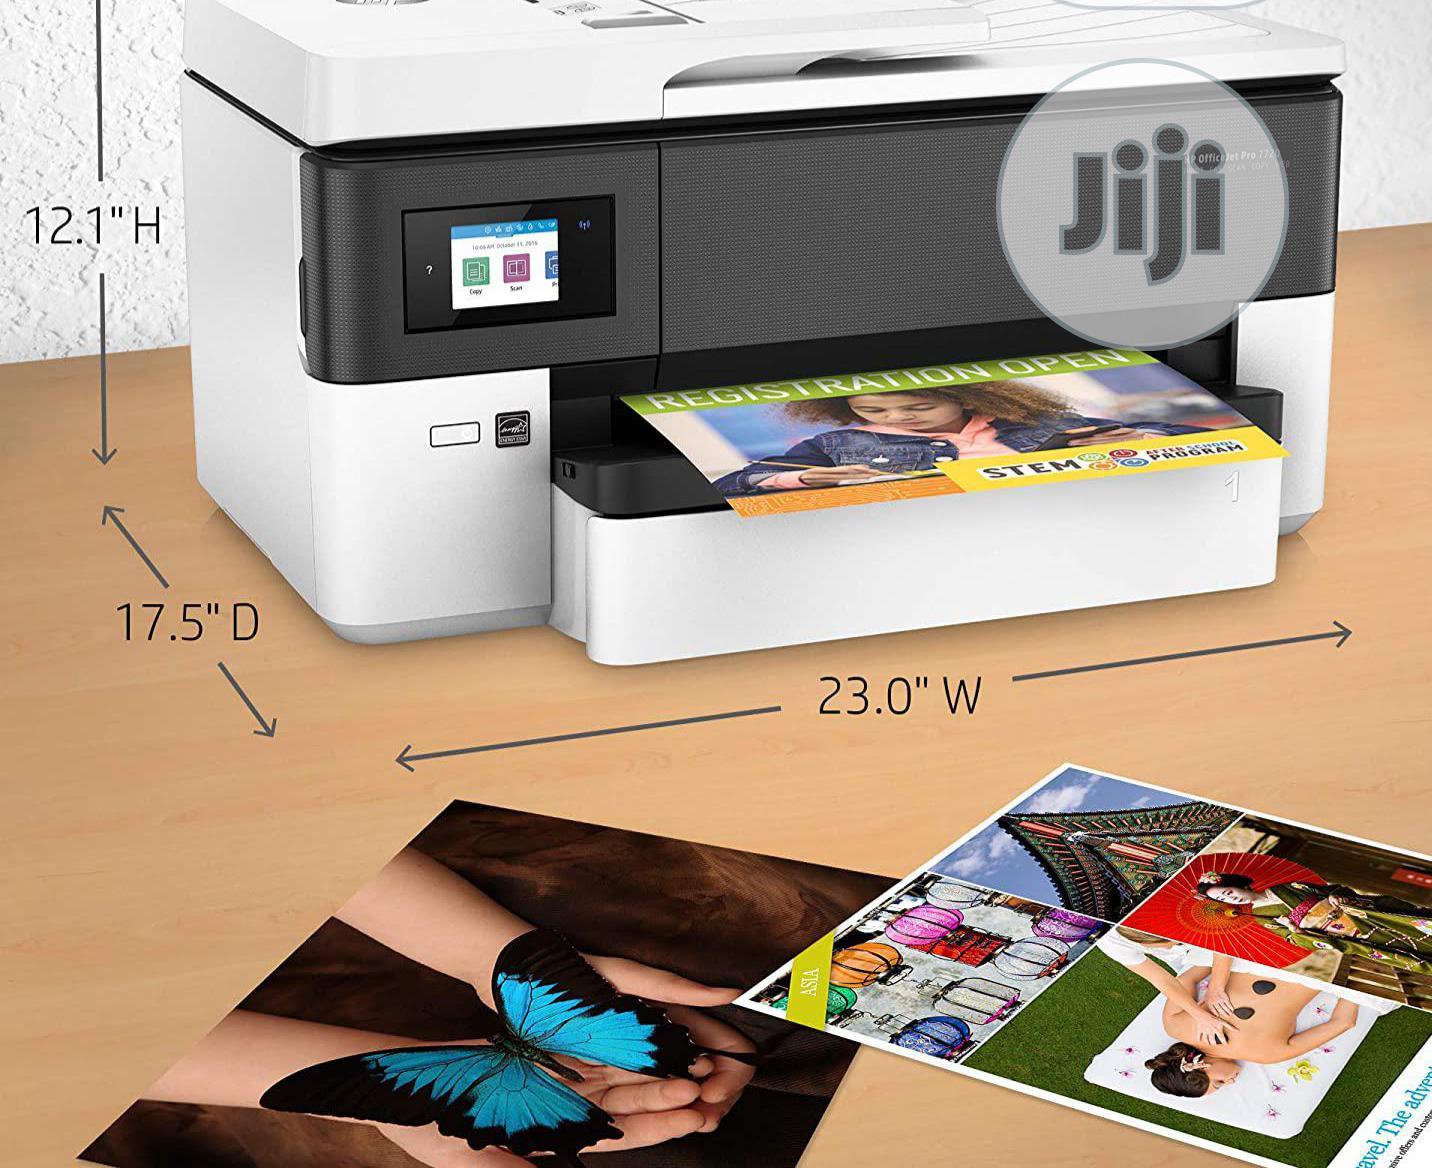 HP Officejet Pro 7720 A3 Wireless All-in-one Printer